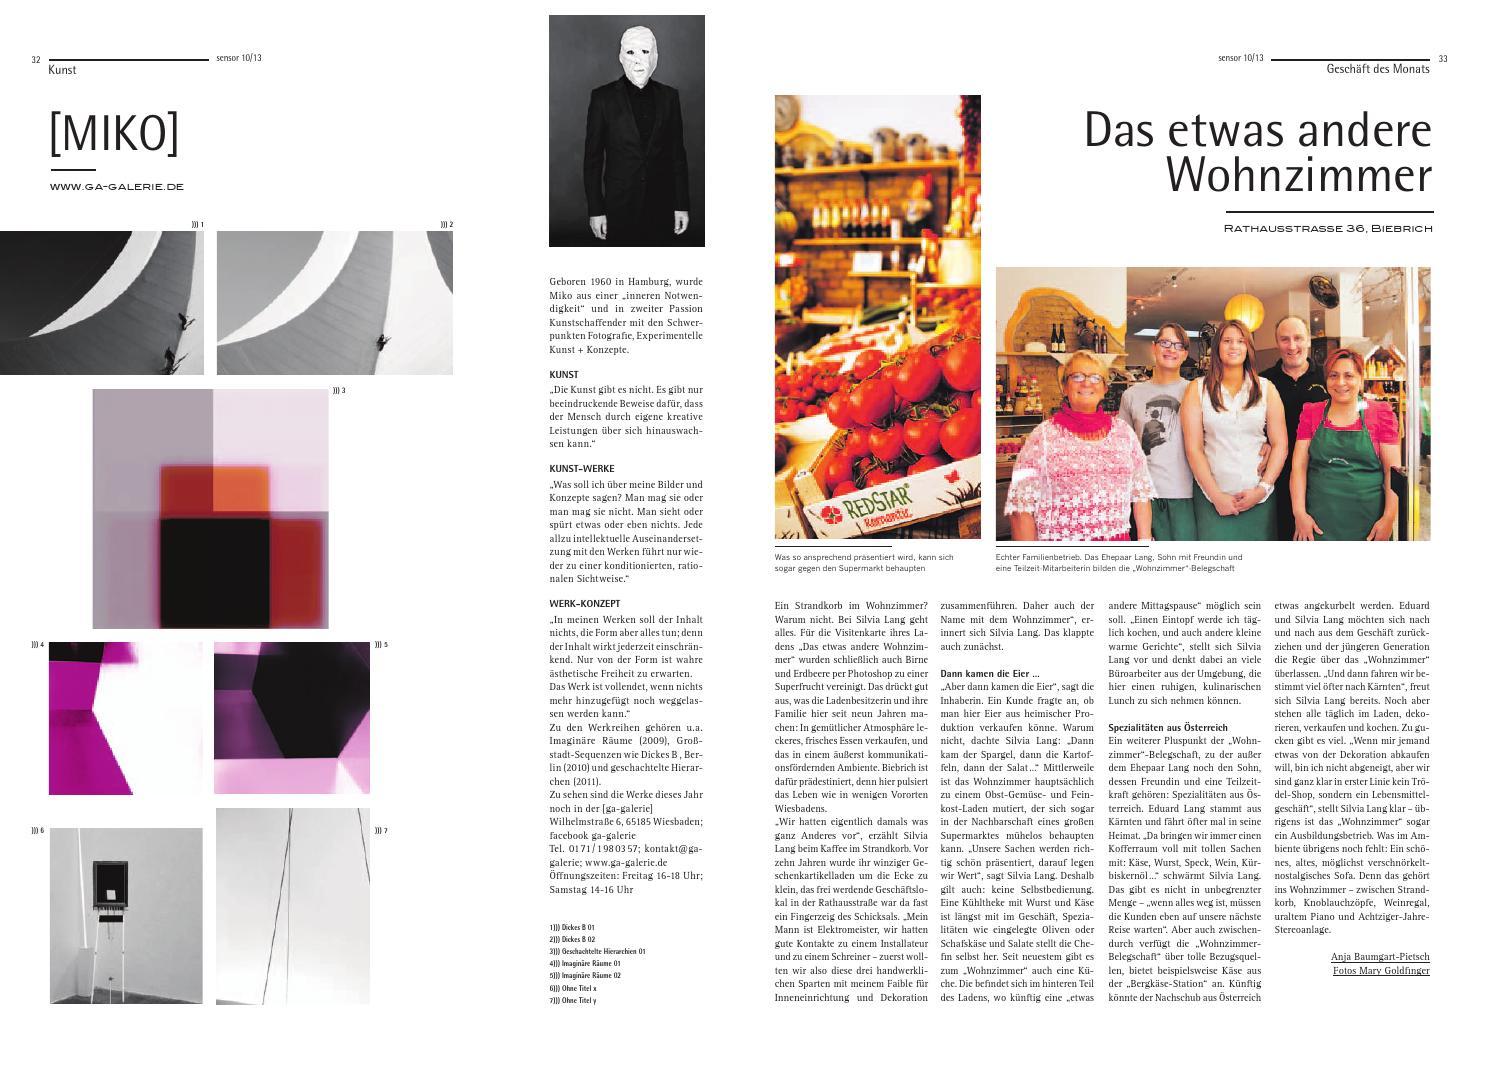 Sensor Wiesbaden 17 Oktober 2013 By Magazin